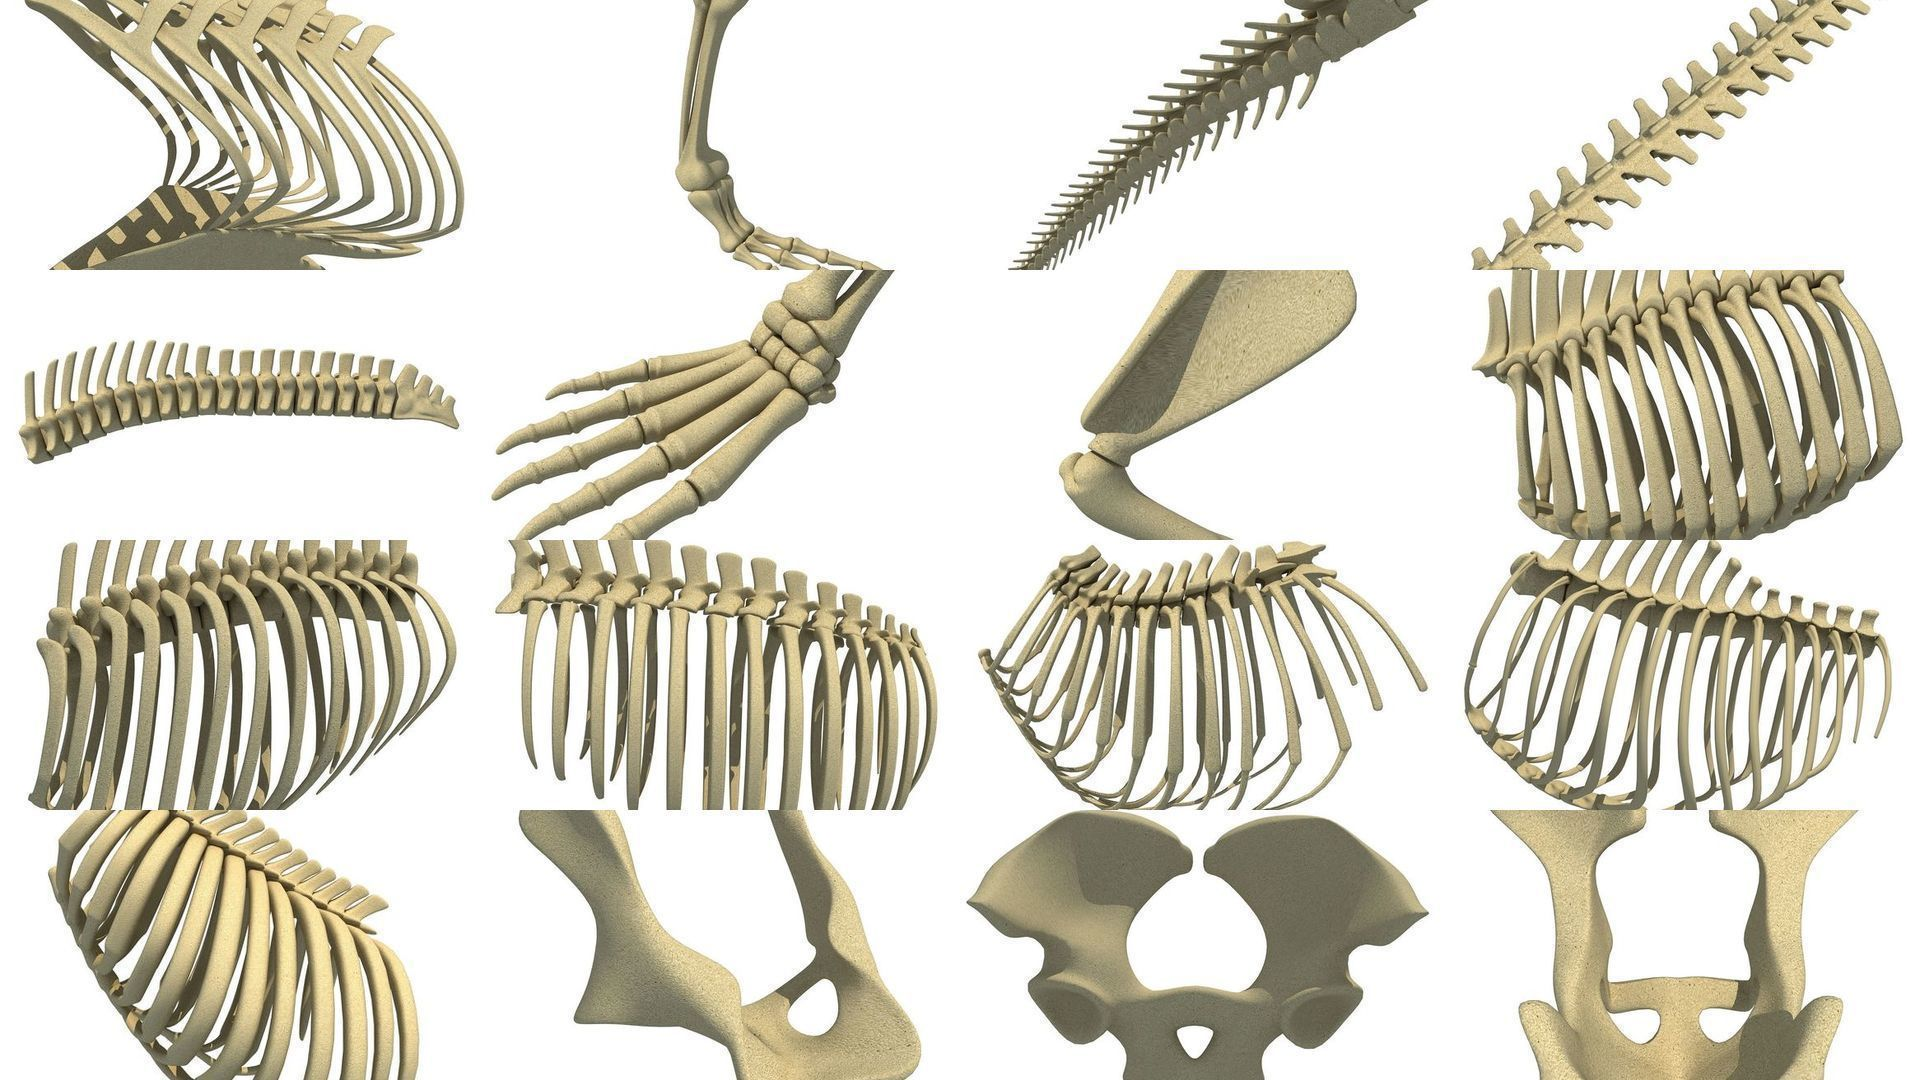 Animal Bones Collection